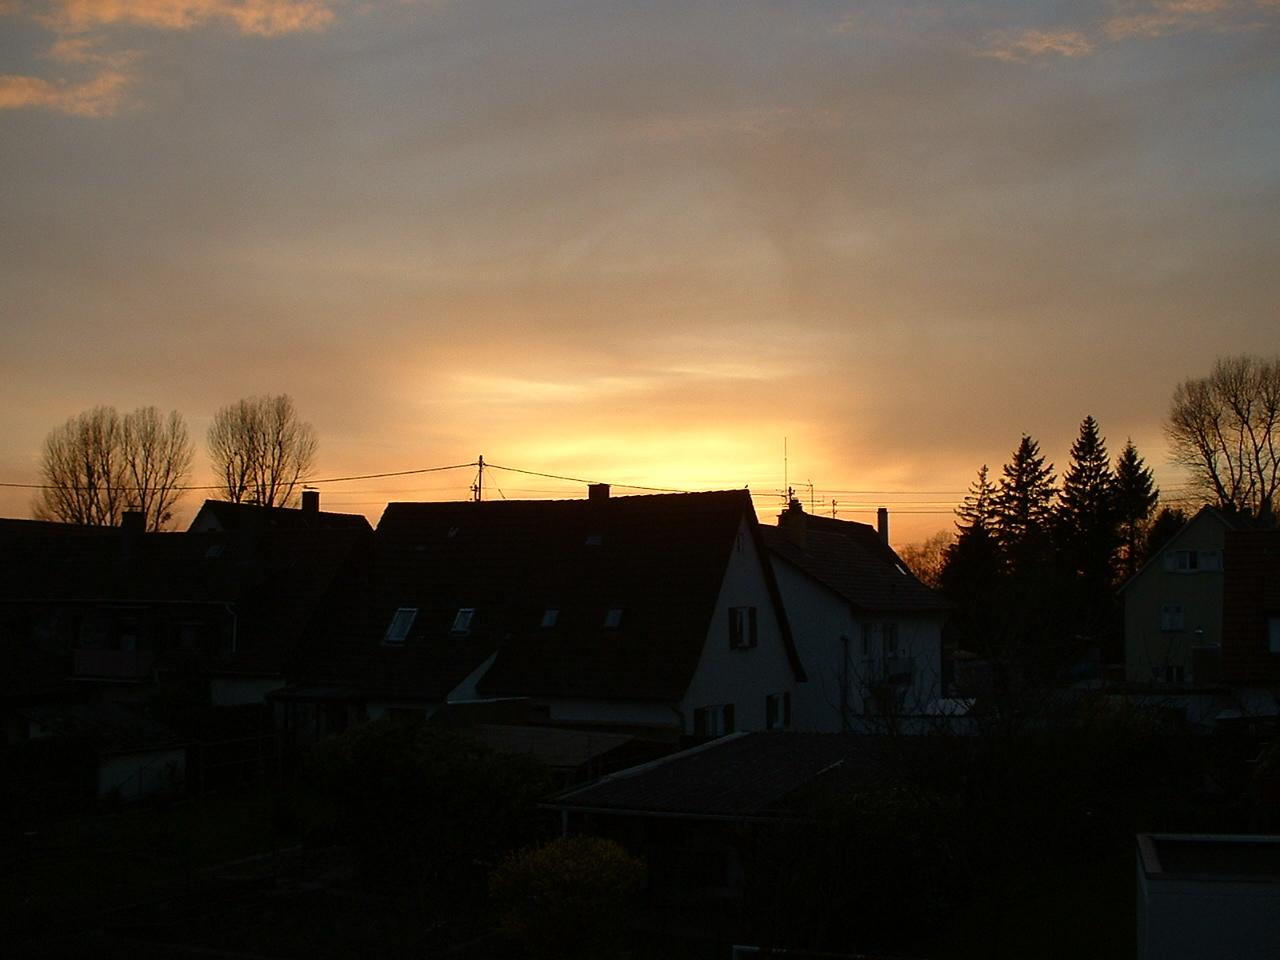 Sonnenuntergang Karlsruhe, 14.2.2011